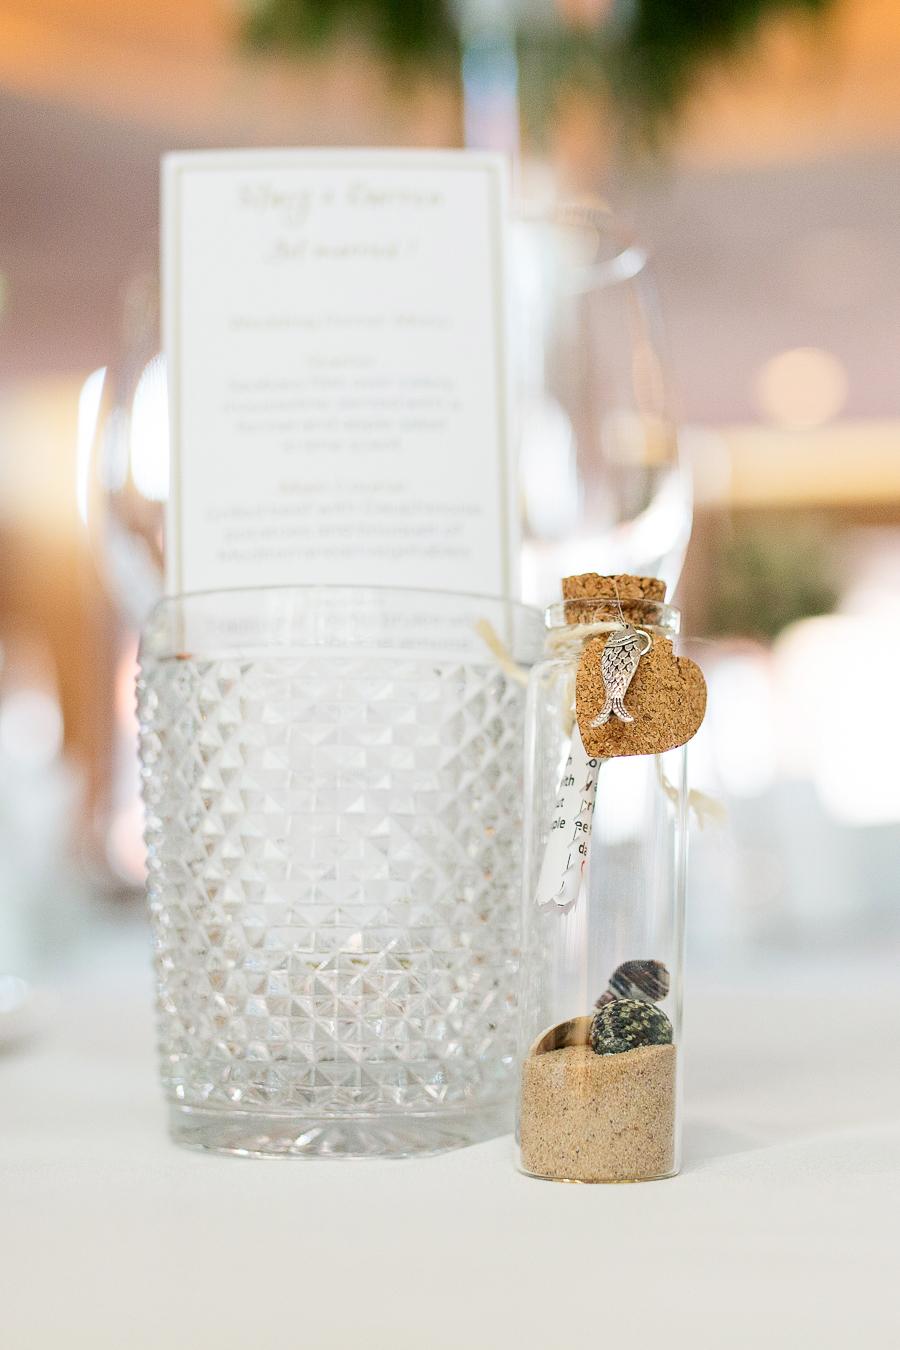 Stacy & Darren's romantic Algarve wedding, with Martin Dabek Photography (3)